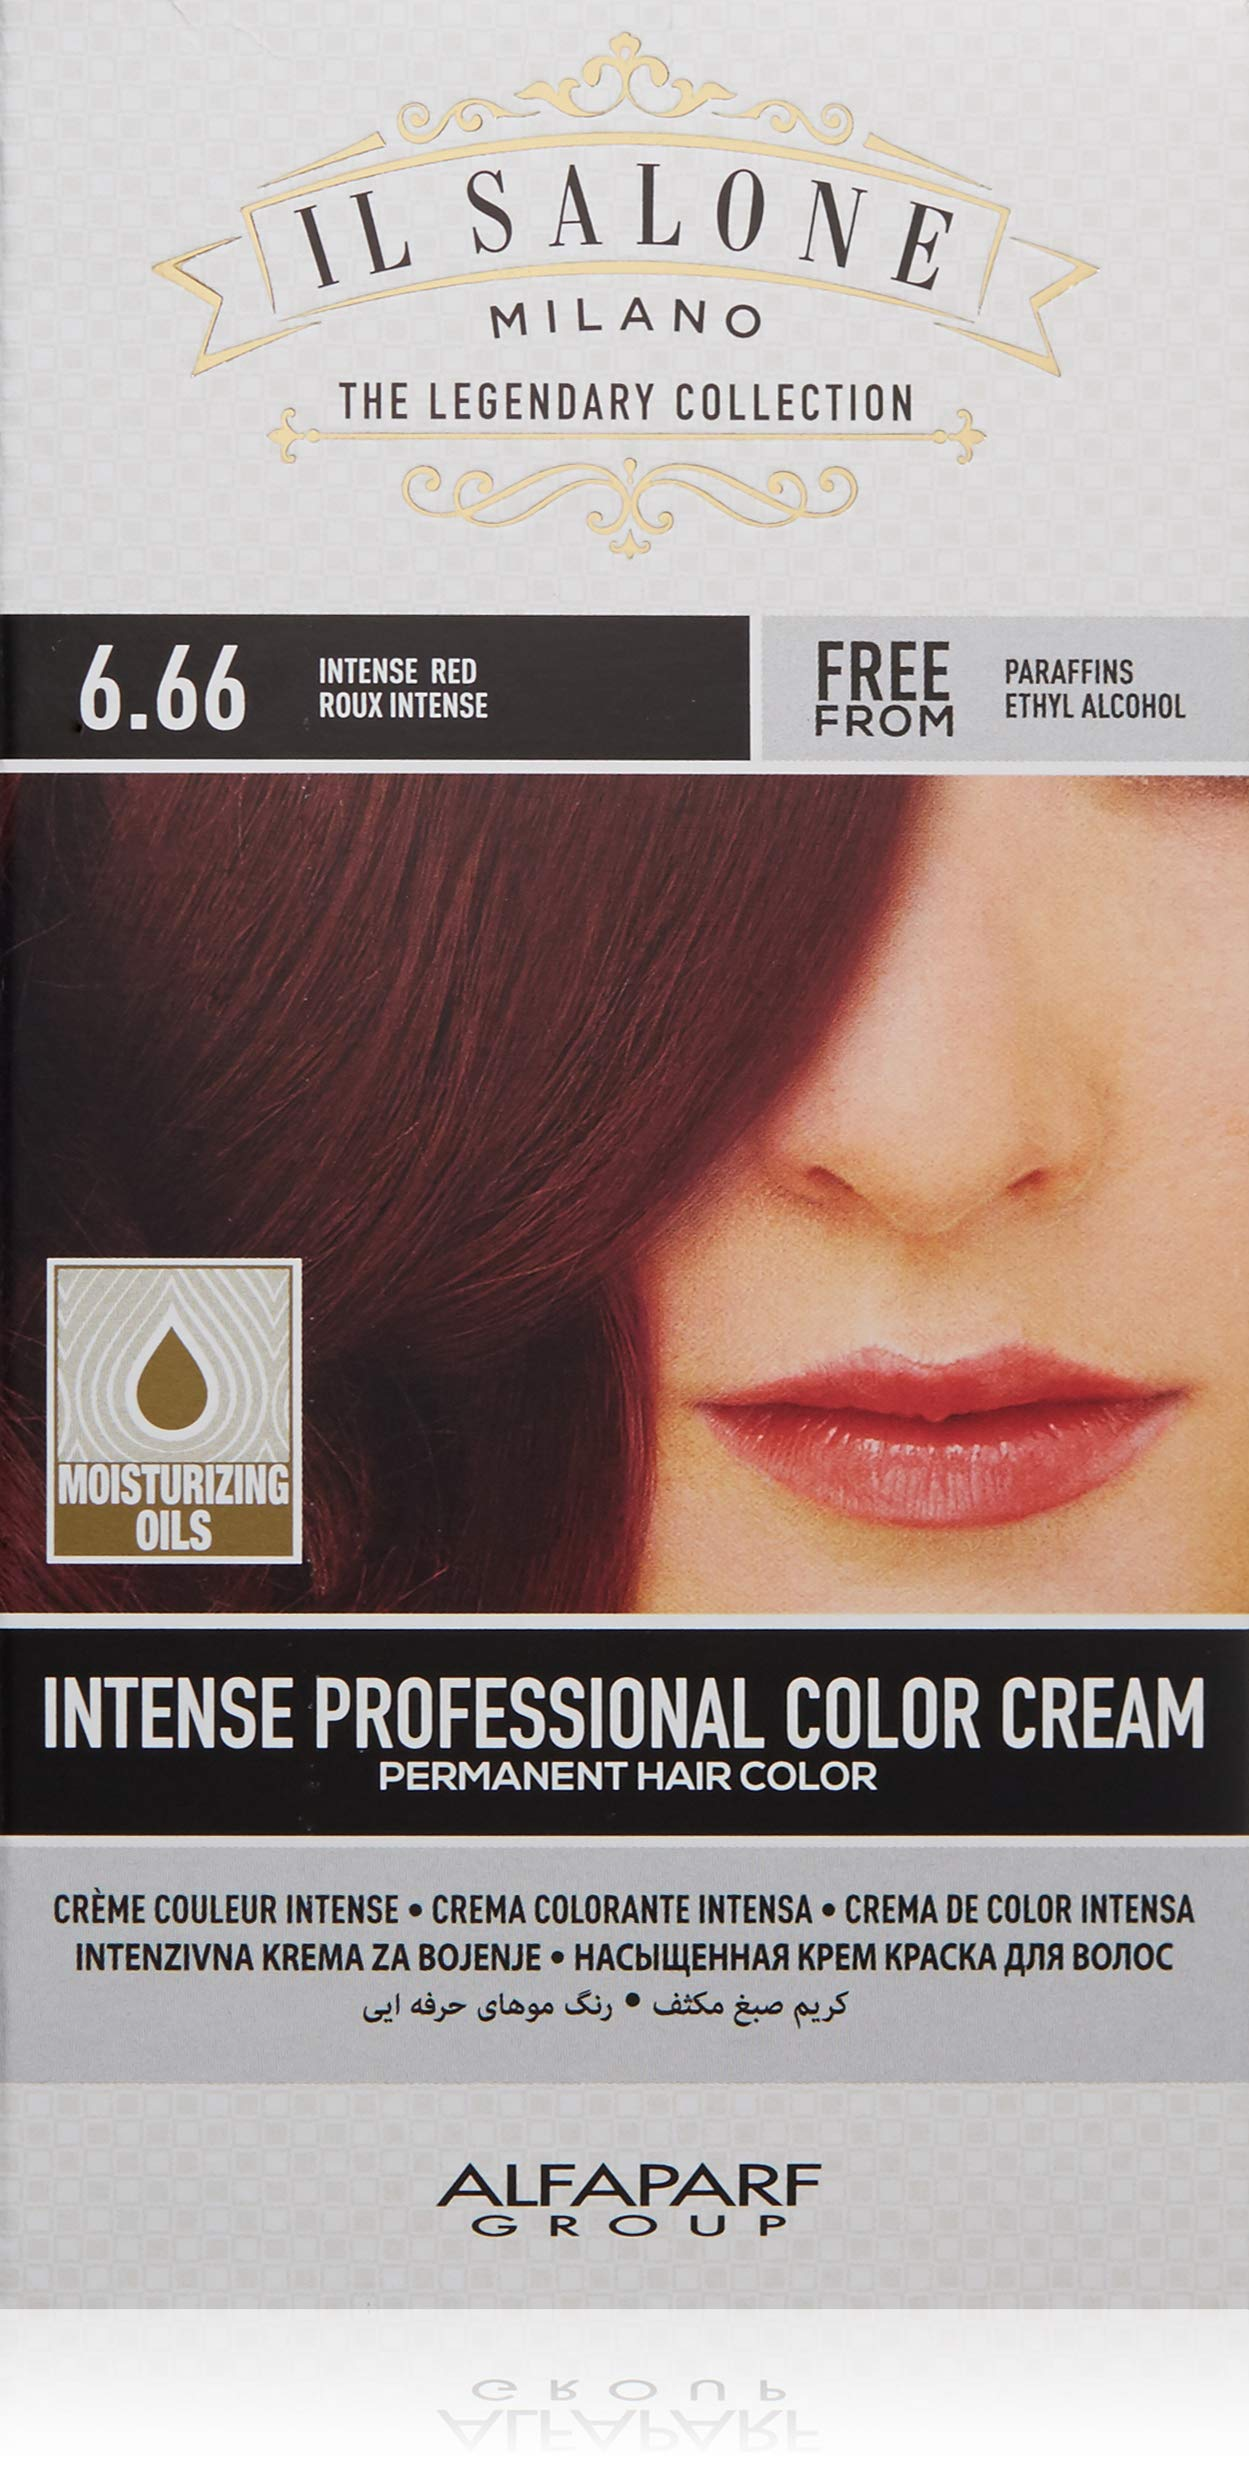 Il Salone Milano Permanent Hair Color Cream - 6.66 Intense Red Hair Dye - Professional Salon - Premium Quality - 100% Gray Coverage - Paraffin Free - Ethyl Alcohol Free - Moisturizing Oils